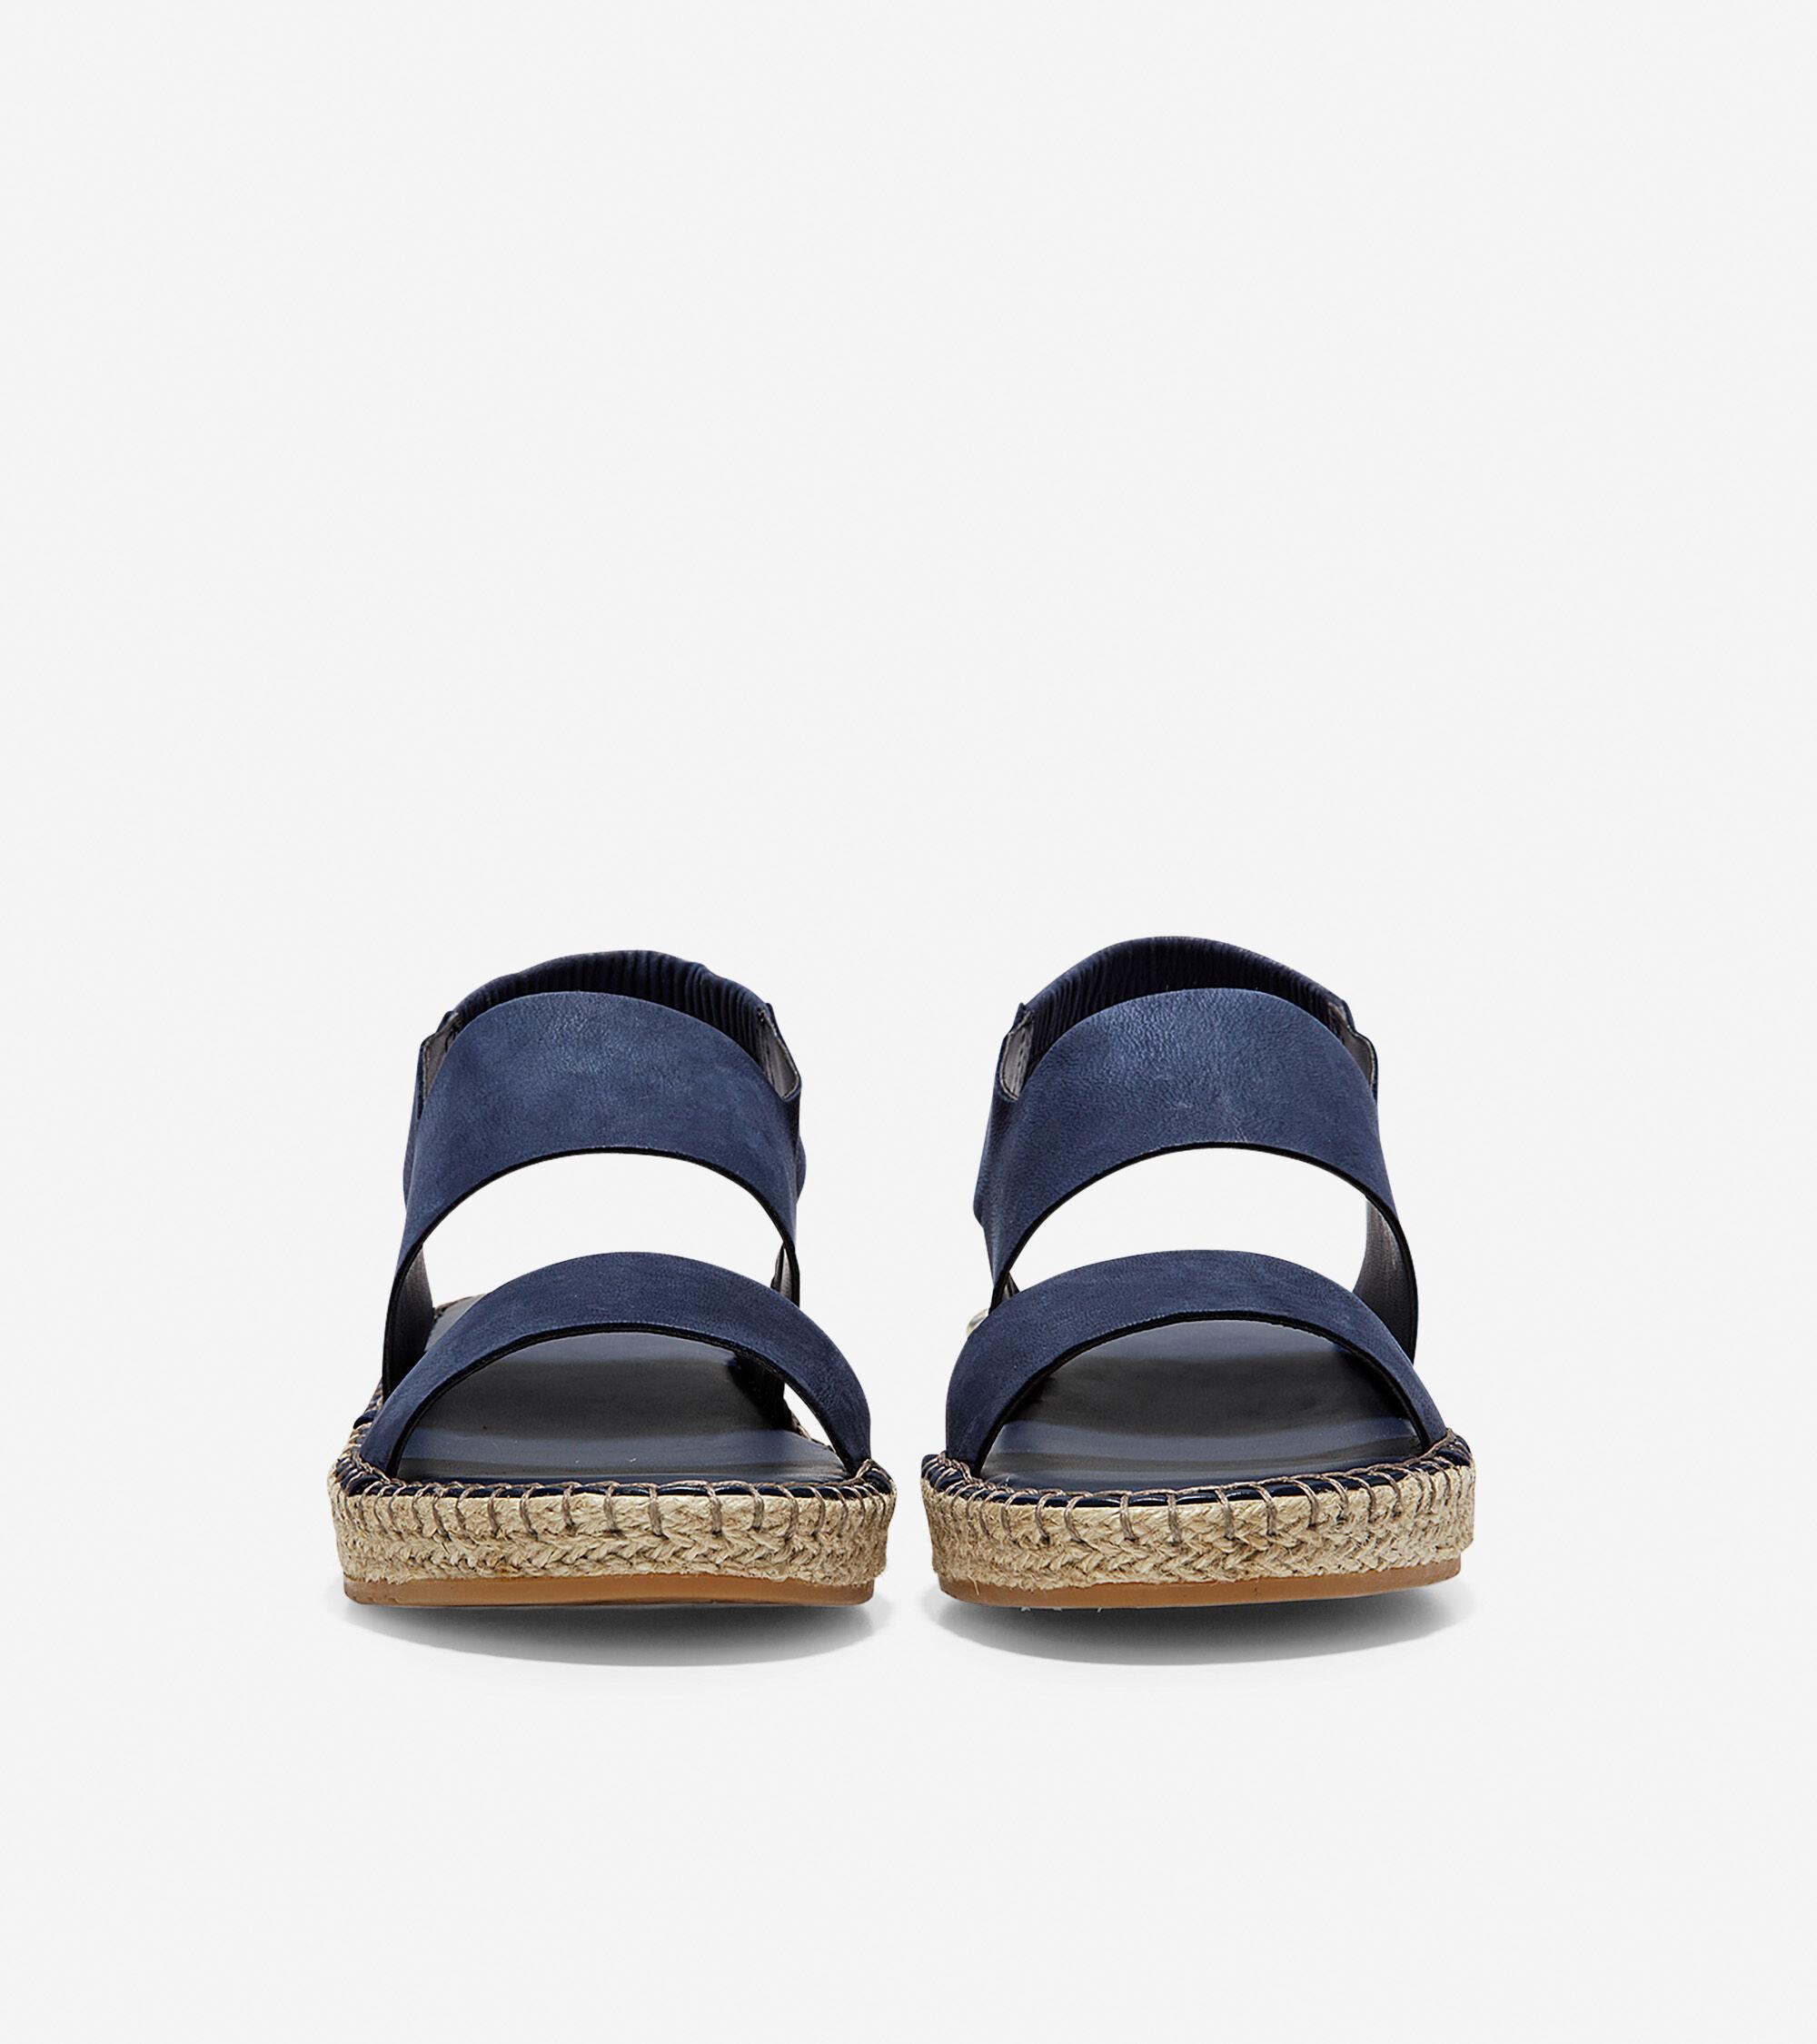 0c6c48b50cd69 Women's Cloudfeel Espadrille Wedges Sandals in Marine Blue | Cole Haan